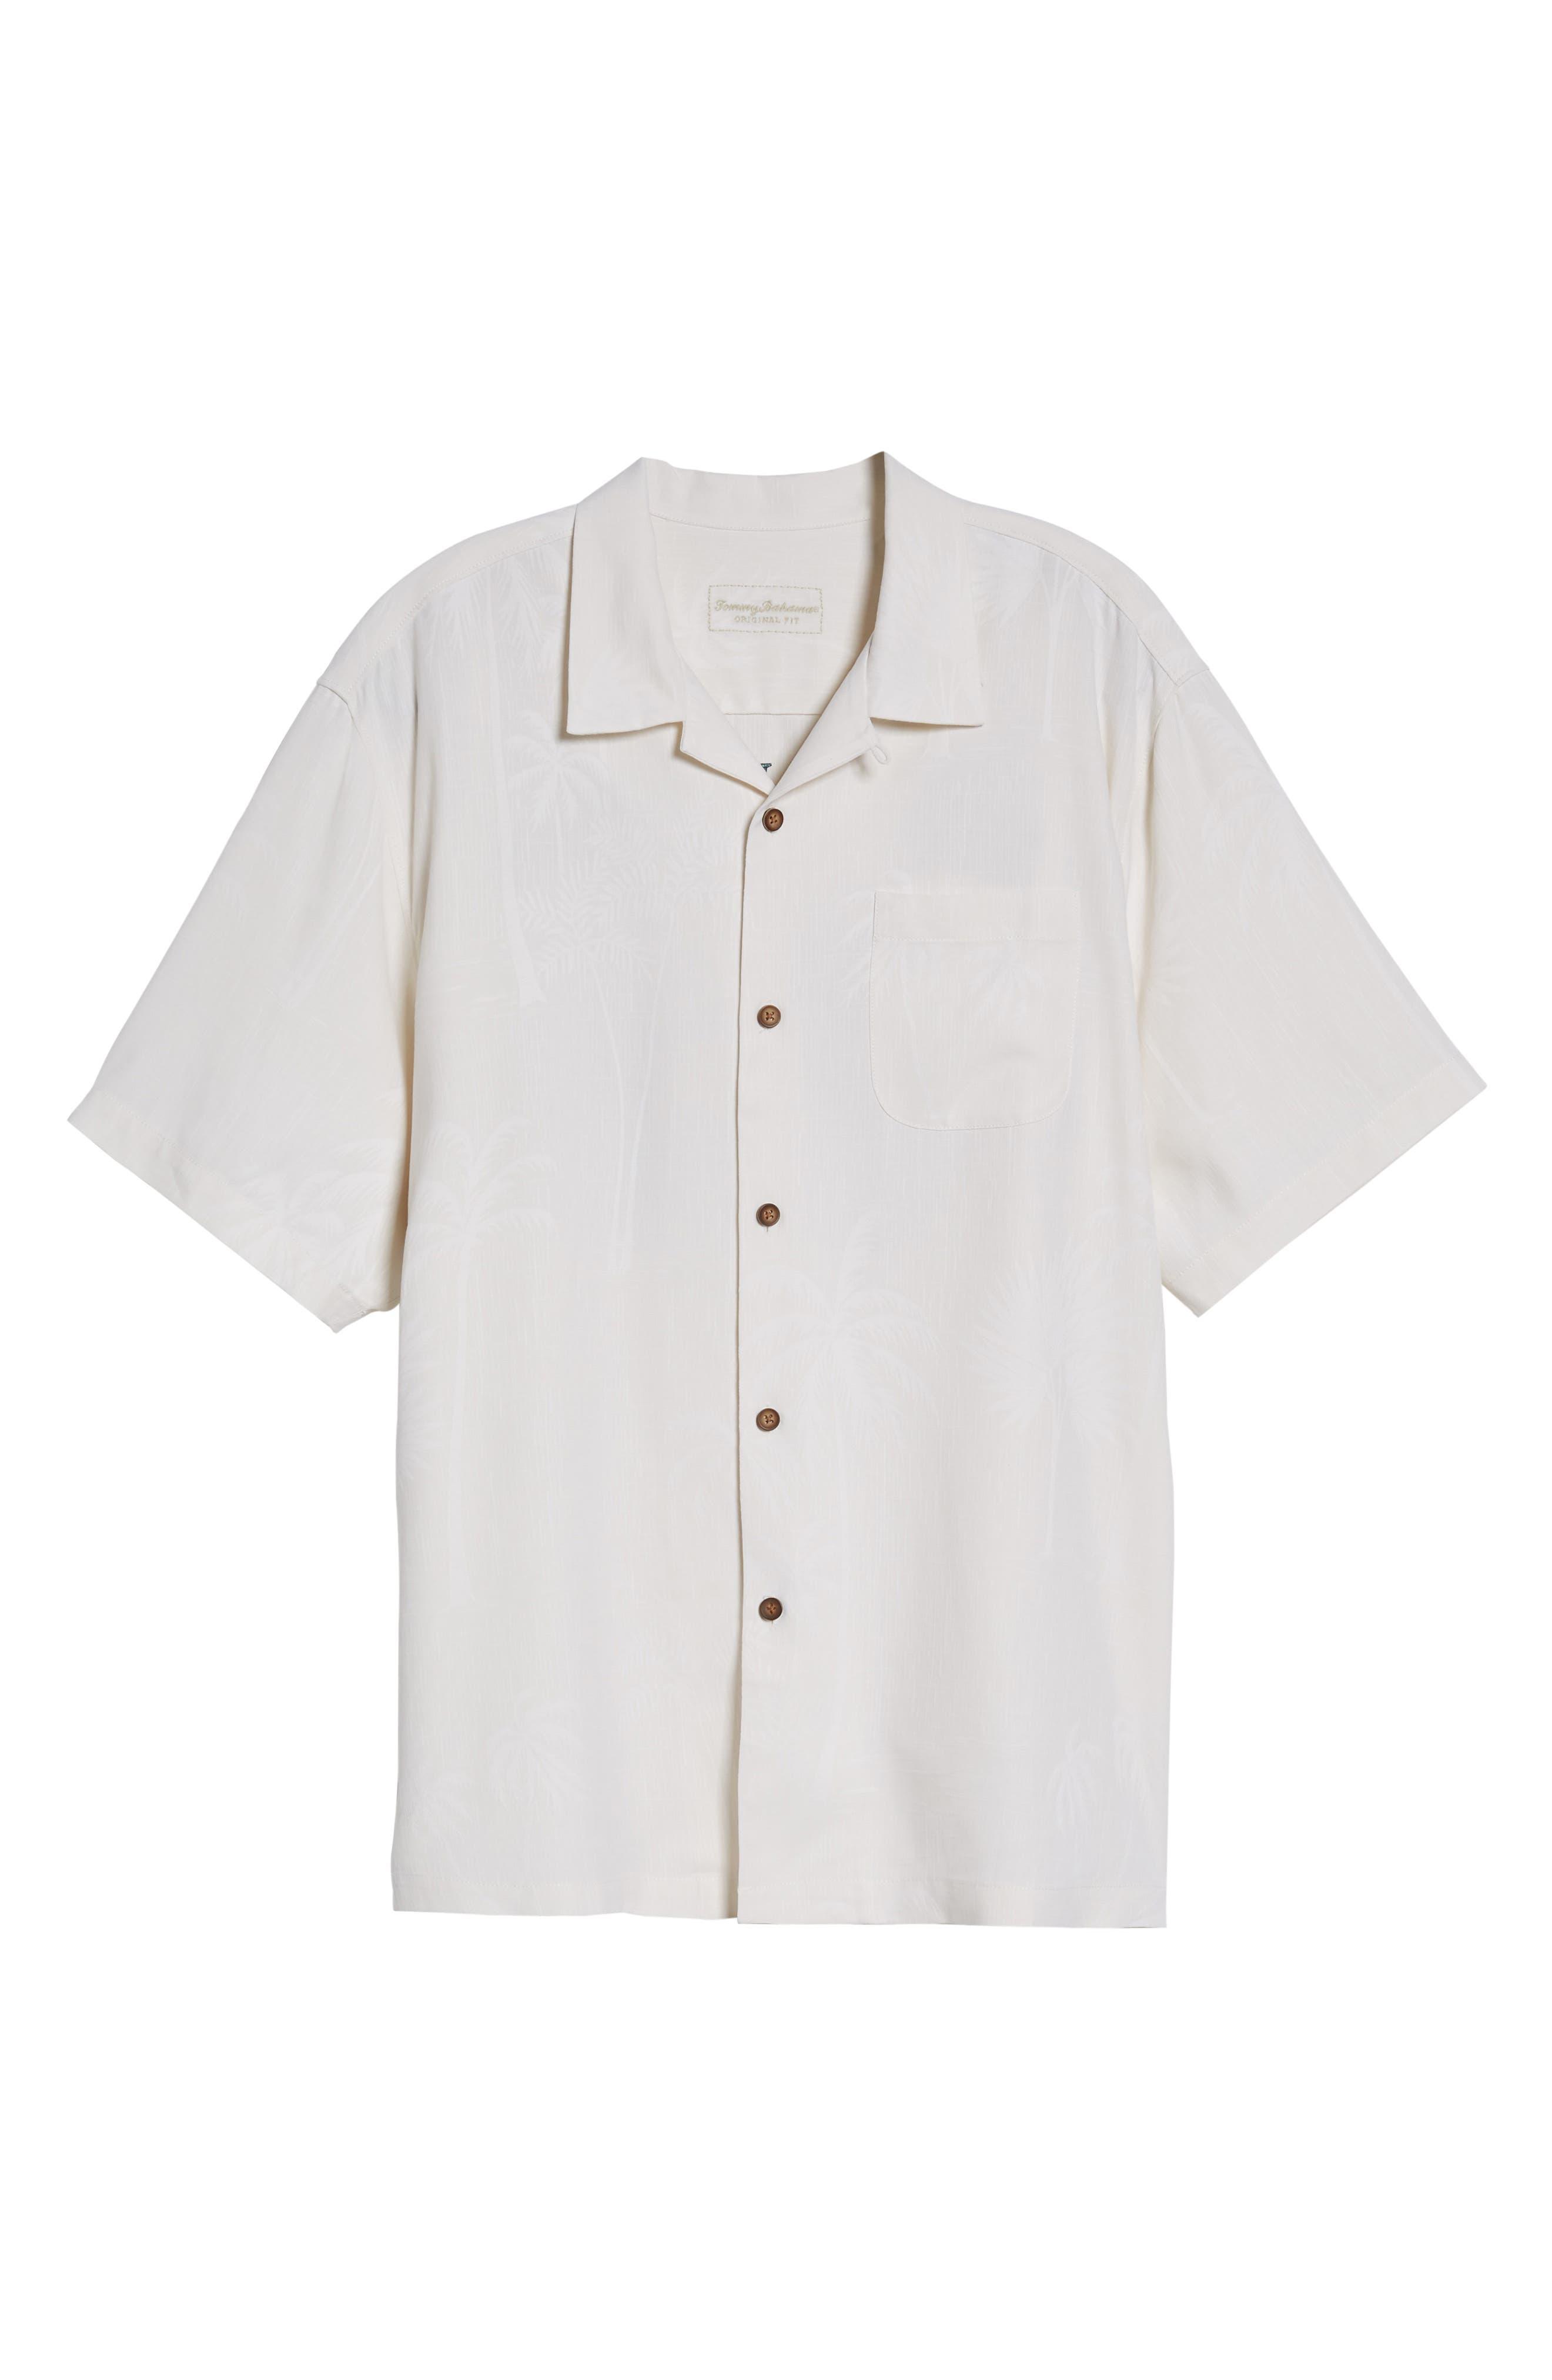 Offshore Sails Silk Camp Shirt,                             Alternate thumbnail 6, color,                             100